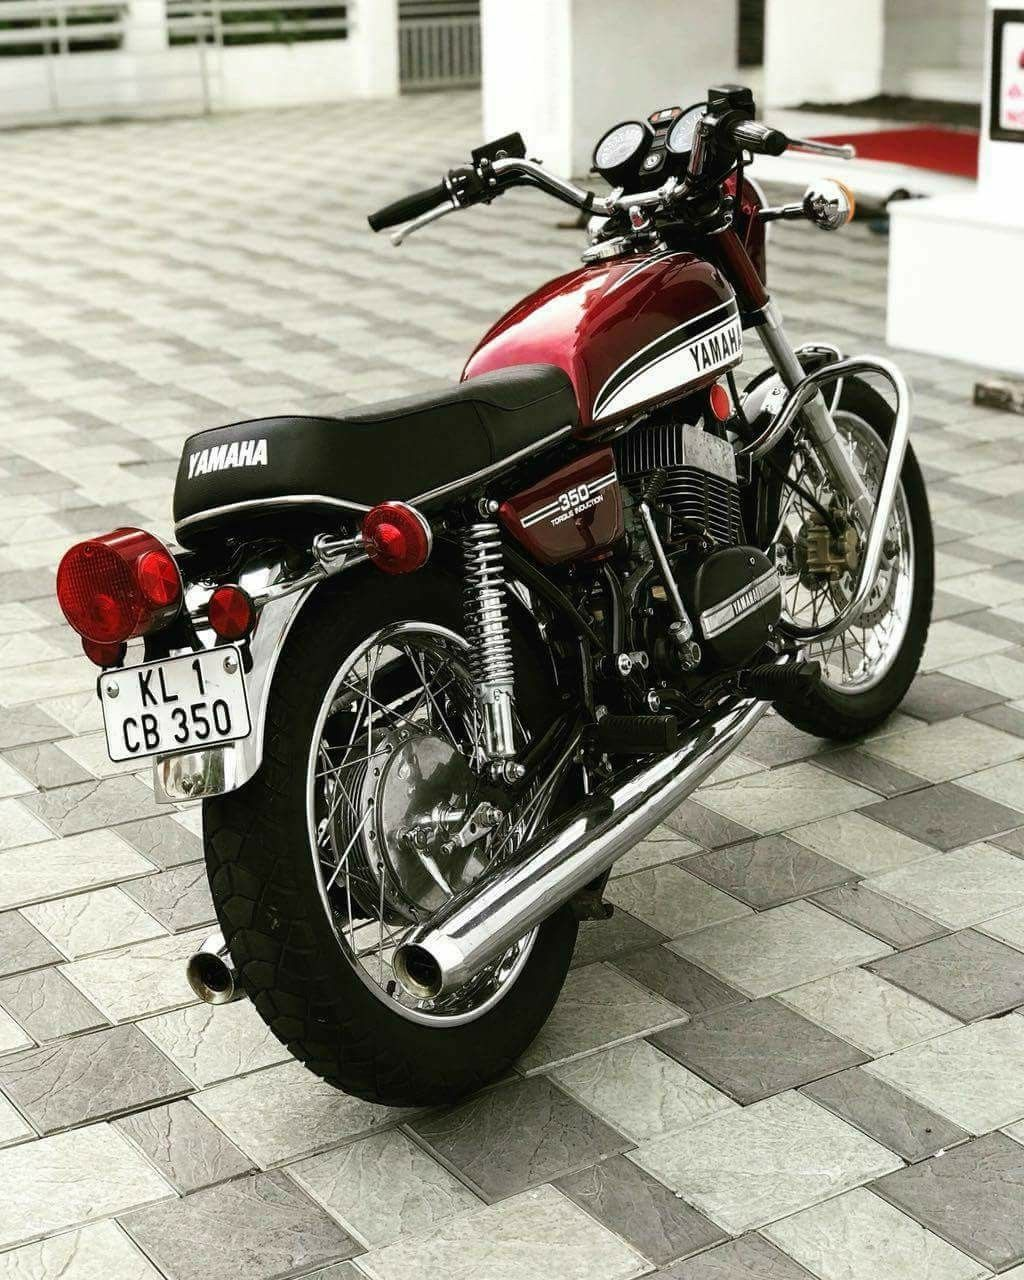 Classy Yamaha Rx 100 Yamaha Motorcycles Yamaha Bikes Yamaha